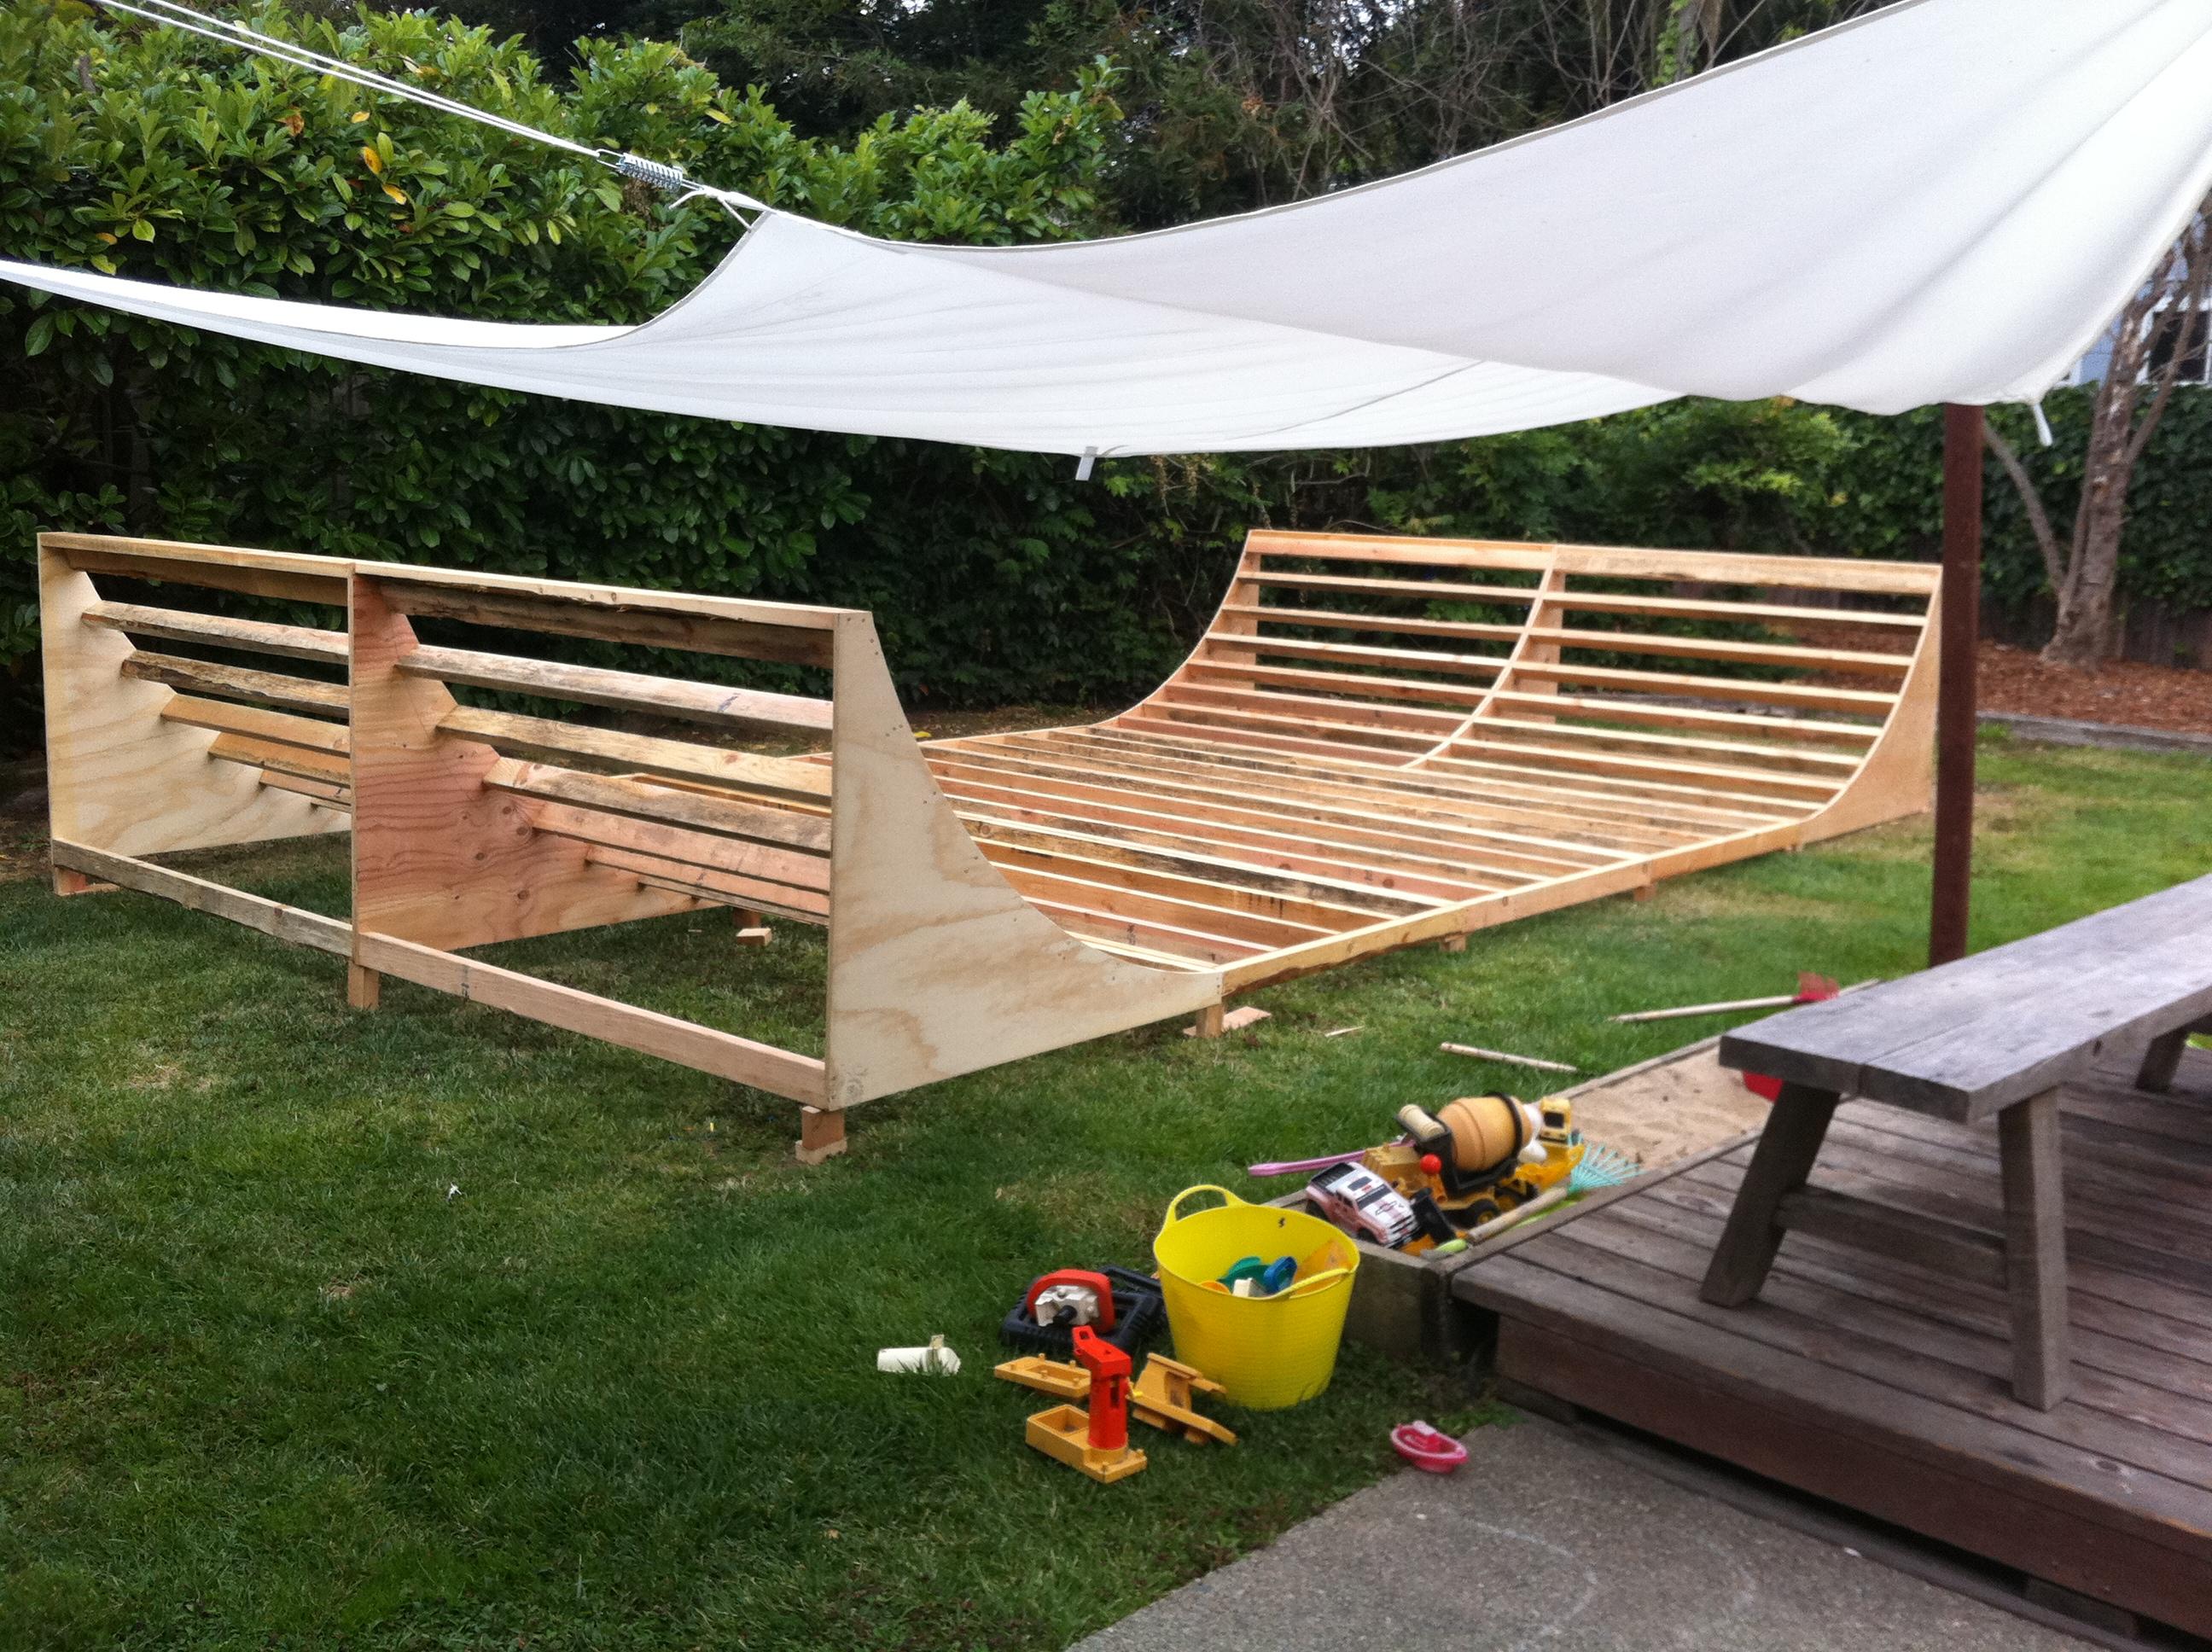 Download Skateboard Ramp Diy Plans DIY Free Home Bar Plans And Layouts : jennifers741